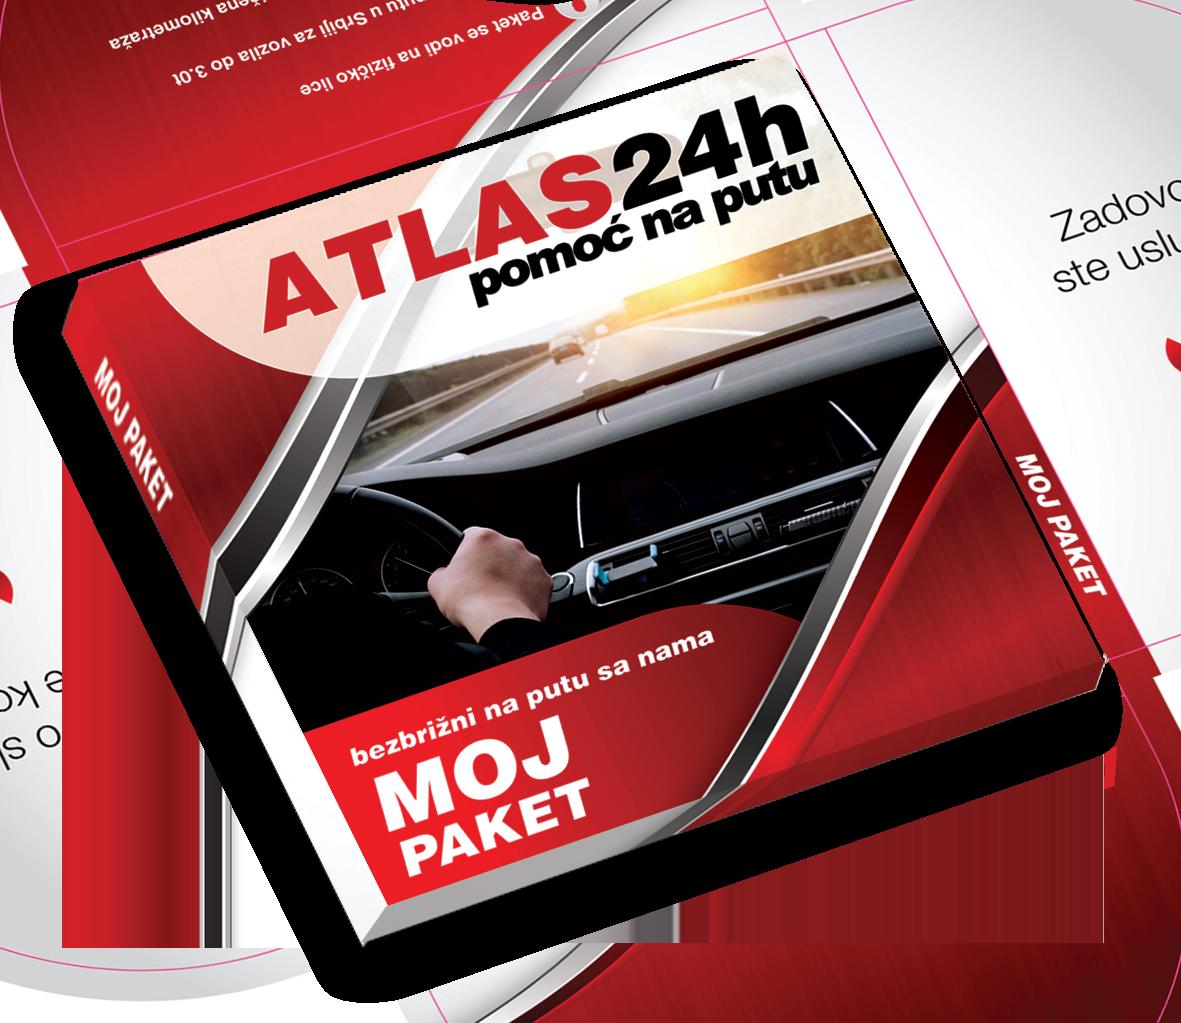 24h Roadside Assistance - Moj-Paket-3D - pomoć na putu